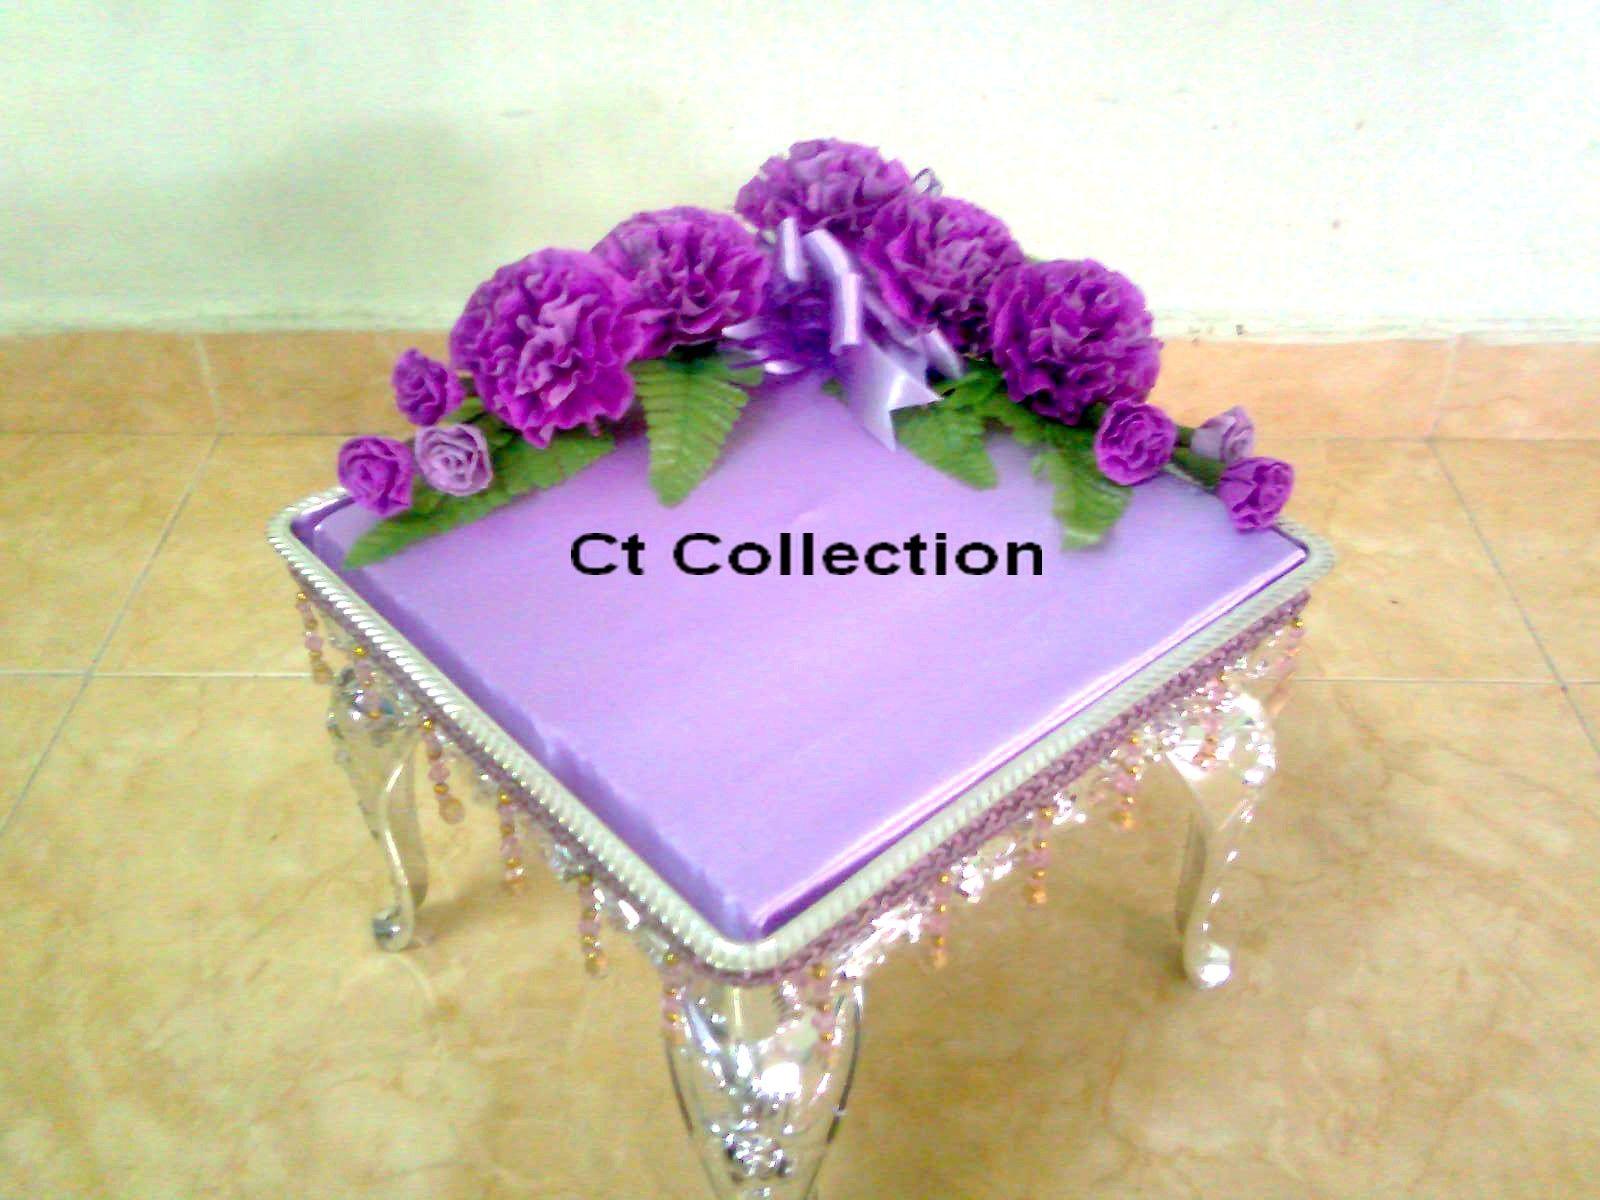 Bunga Tisu Dulang Board Me Pinterest Pahar Malay Macaron Kotak Choco Wedding Prep Gift Baskets